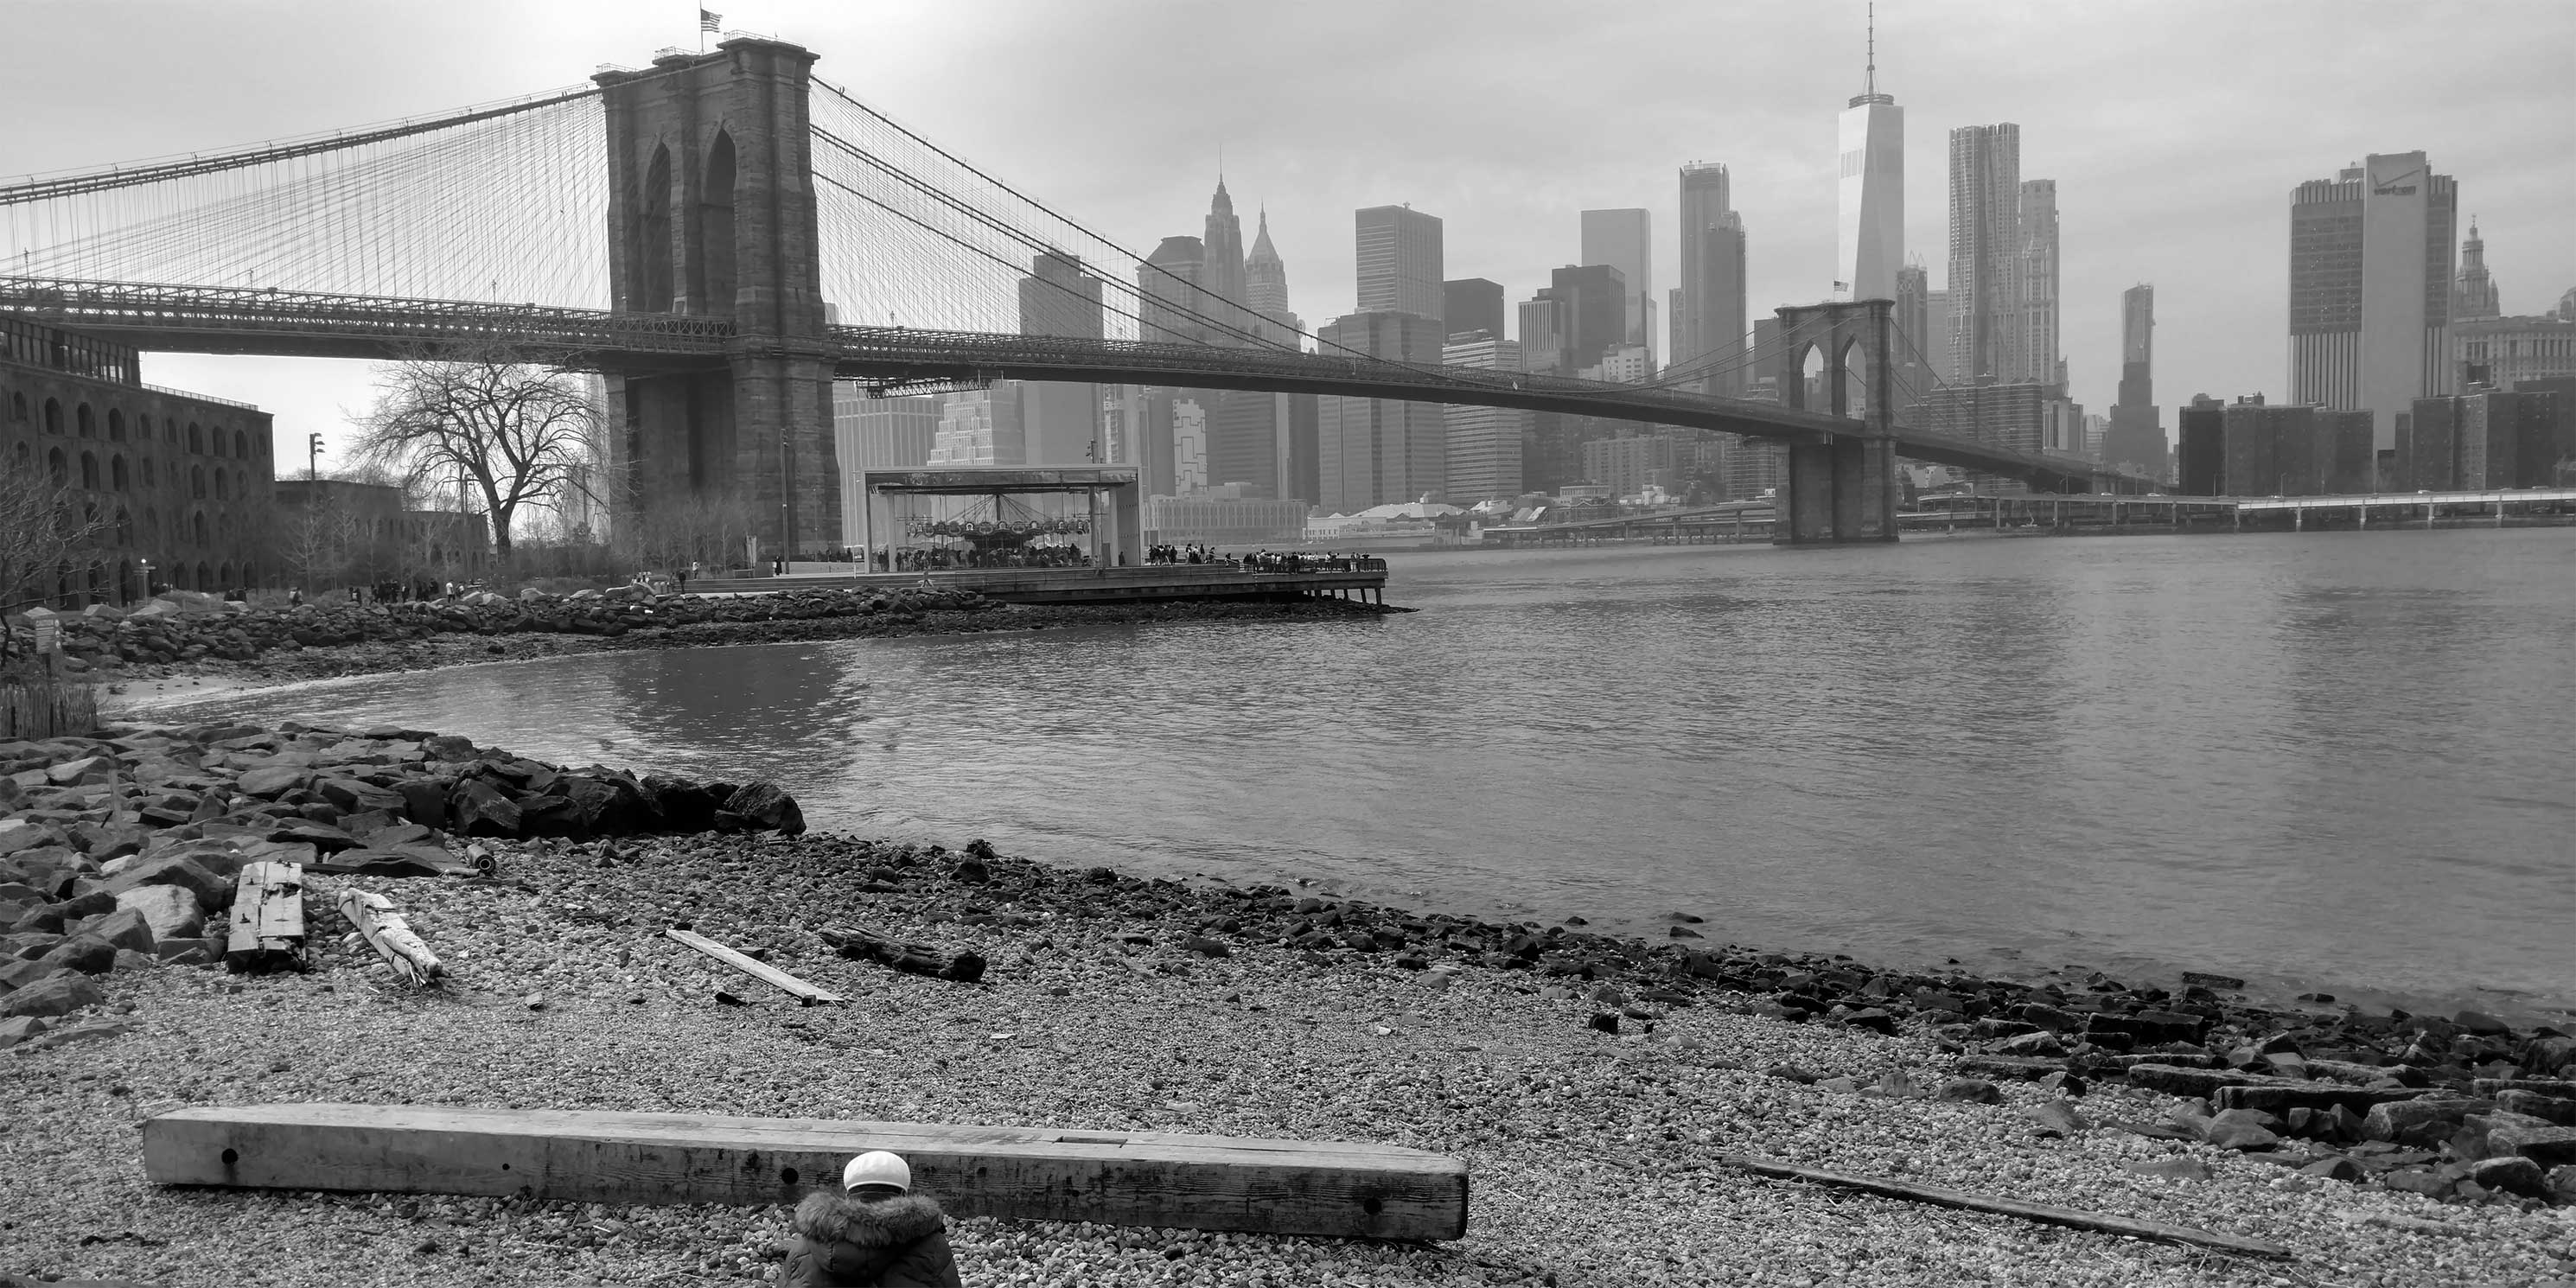 Brooklyn Bridge and Jane's Carouse below it